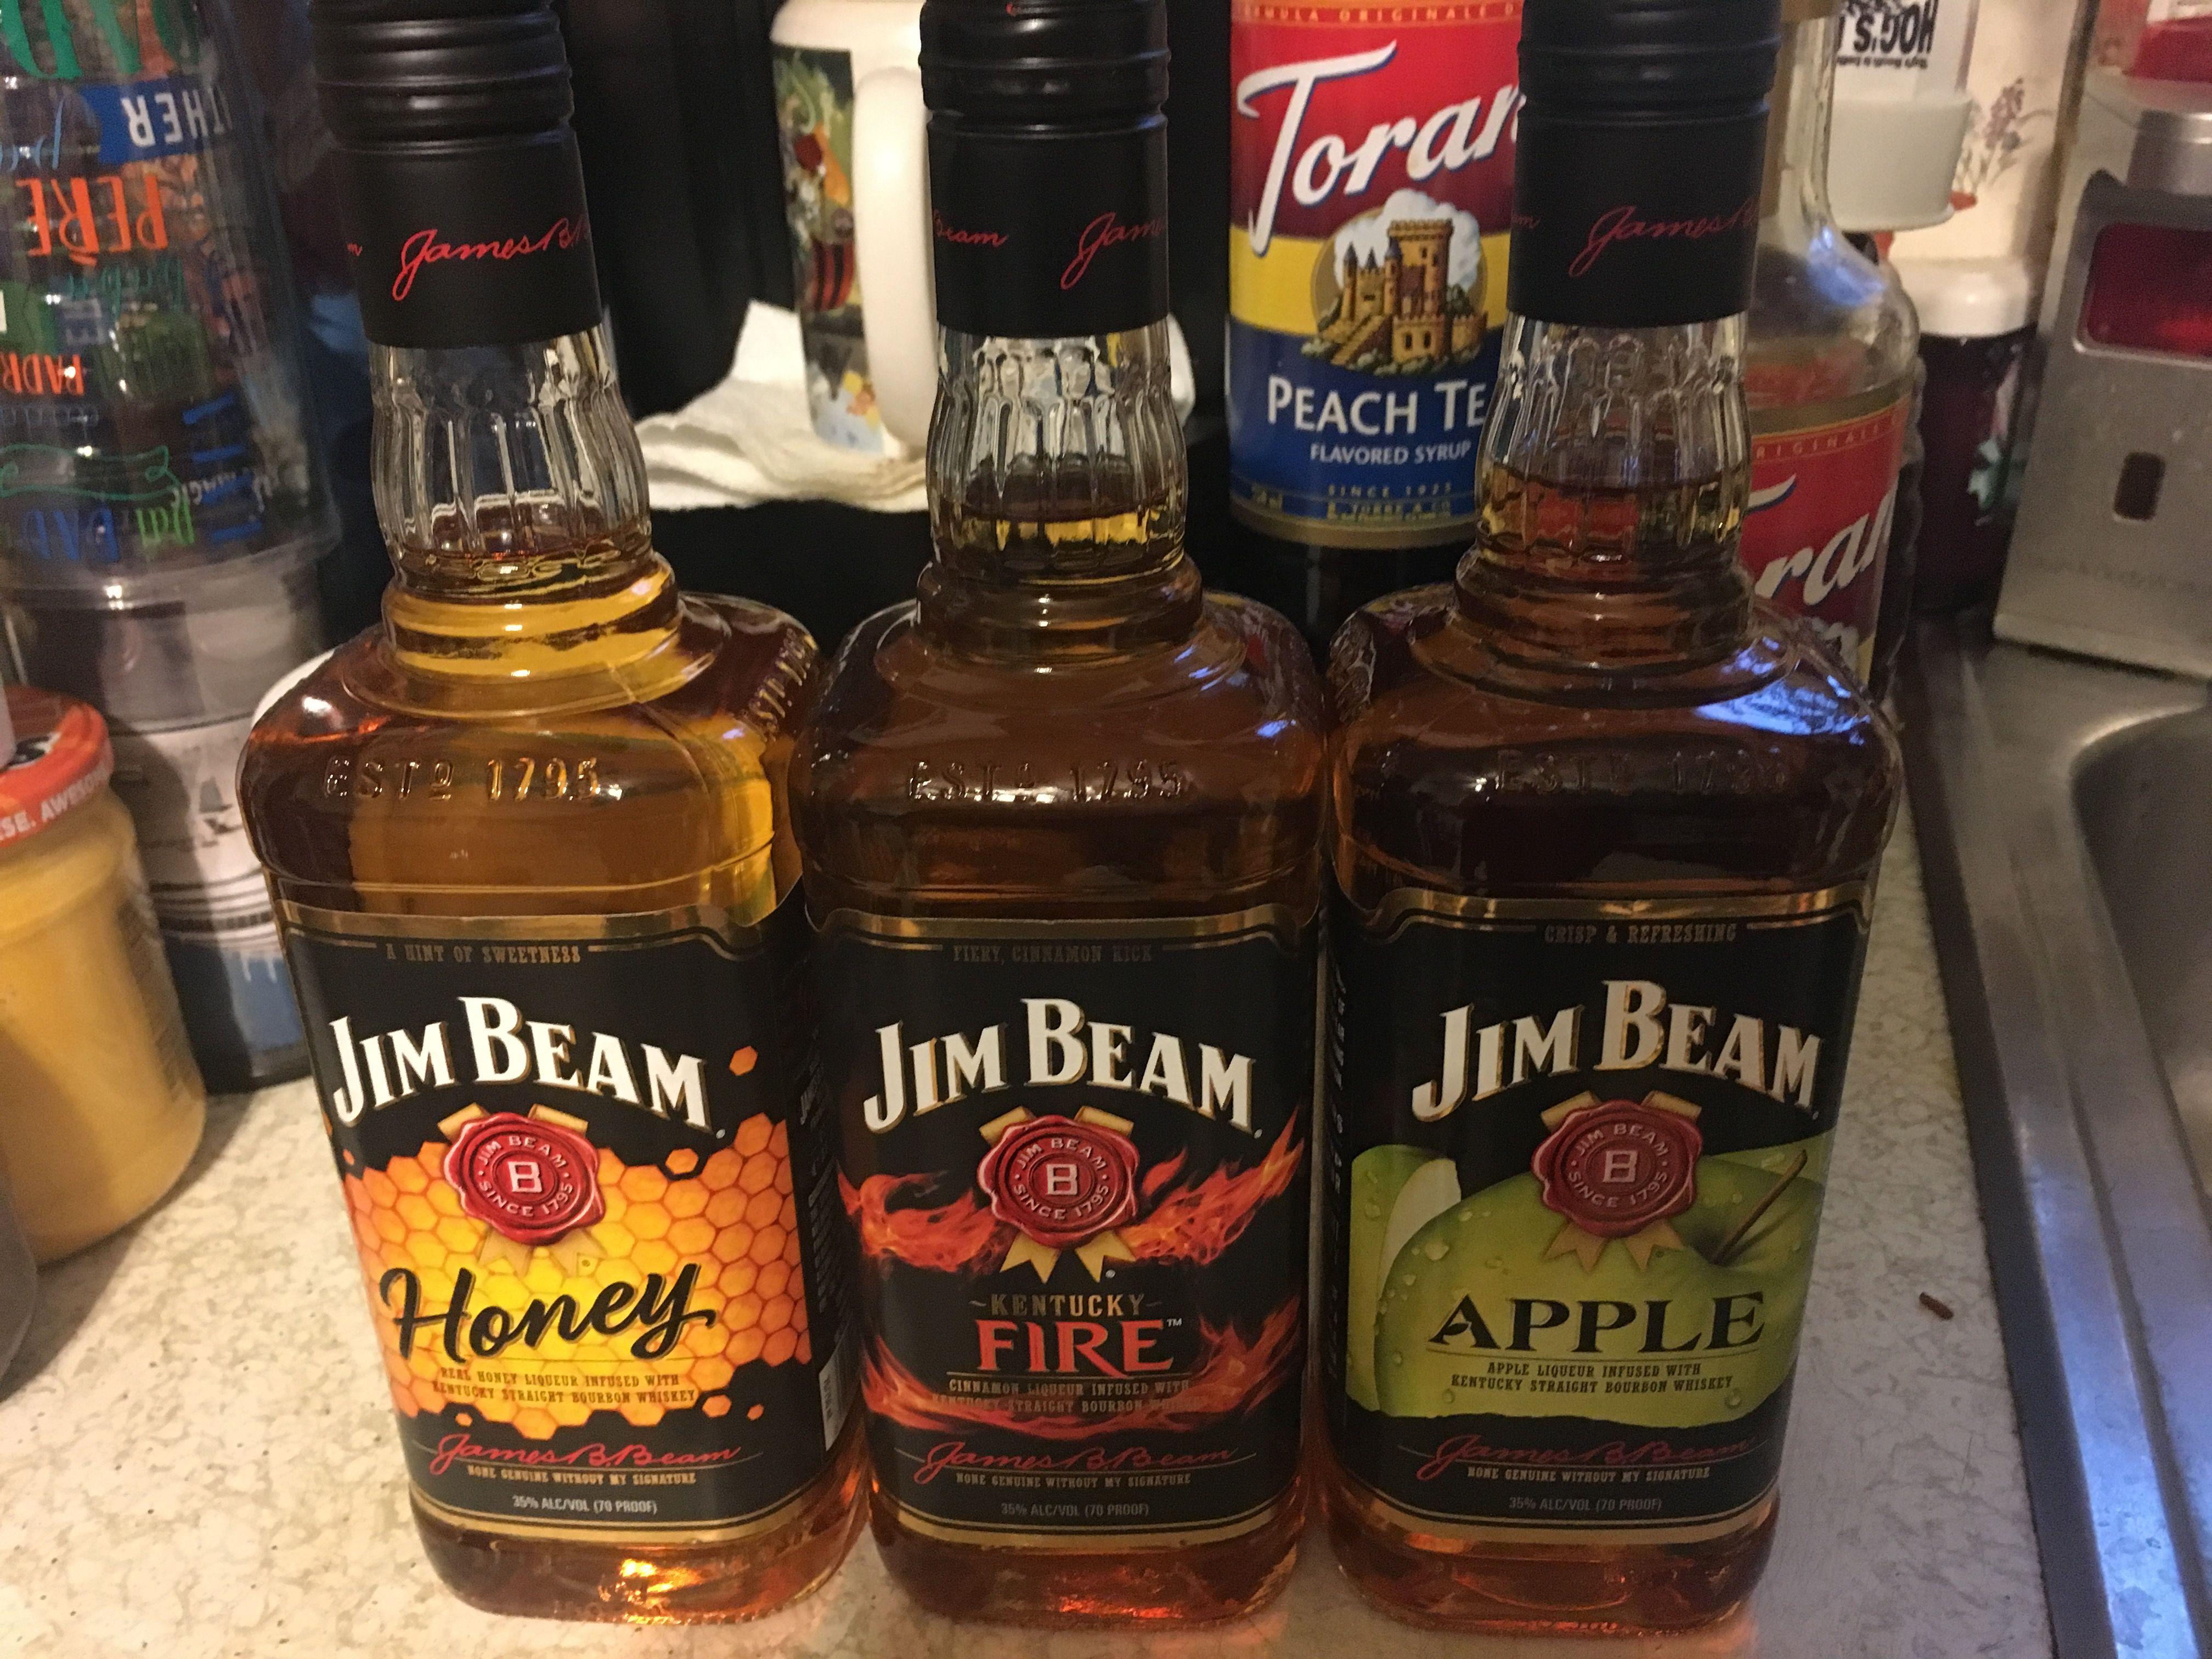 Jim Beam Fire In My Coffee Regular Coffee Vanilla Creamer Sugar 1 Shot Jim Beam Fire Stir Enjoy Vanilla Coffee Jim Beam My Coffee